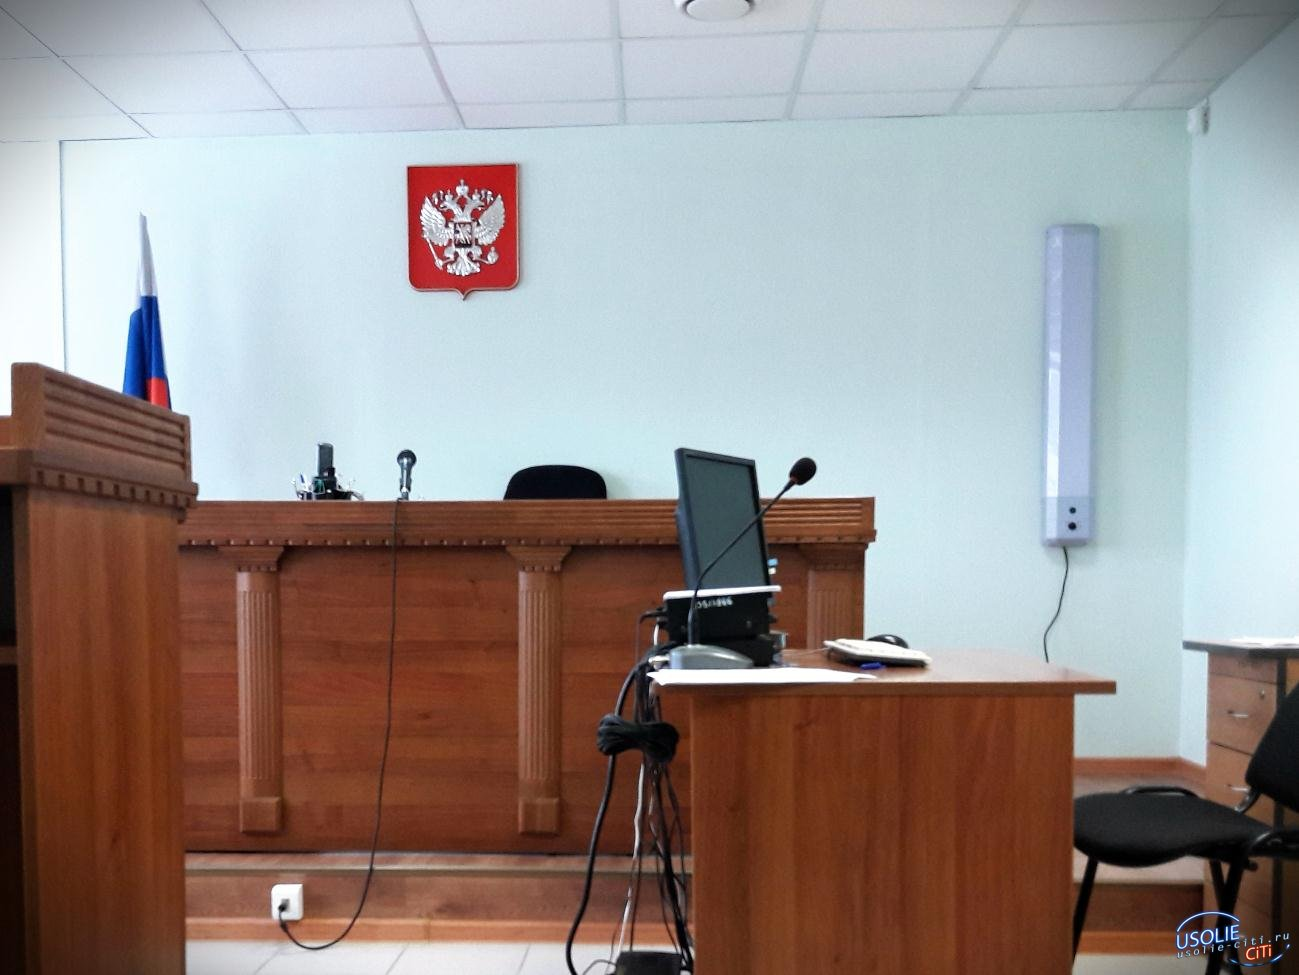 Осужден: Усольчанин на вахту отправился с наркотиками